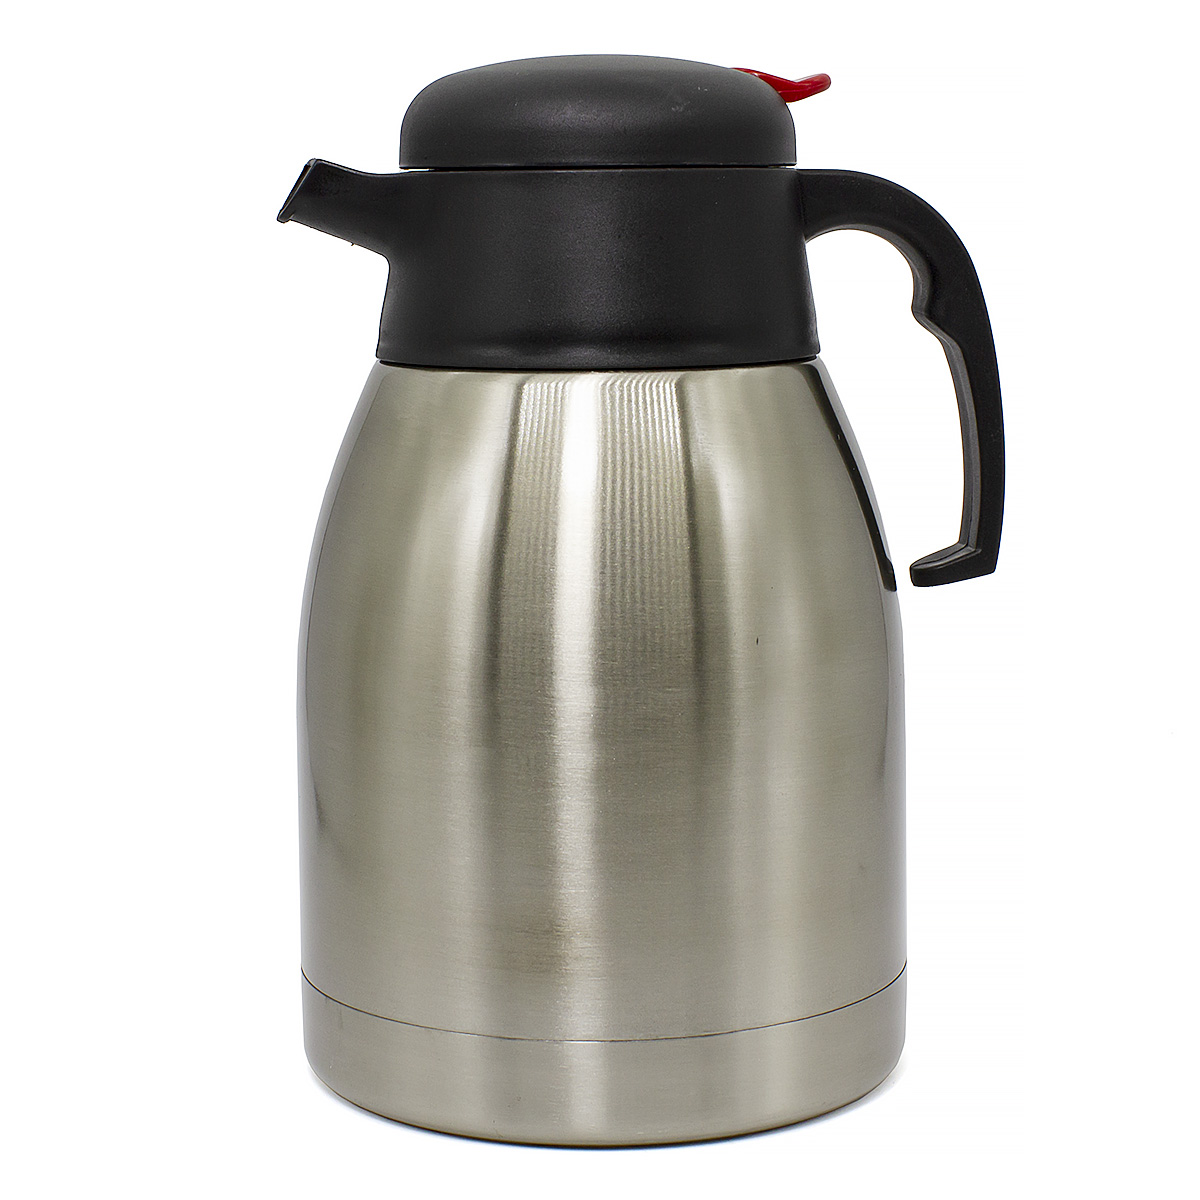 Металлический термос Vacuum Bottle, 1500 мл термос robens wilderness vacuum flask 700 мл